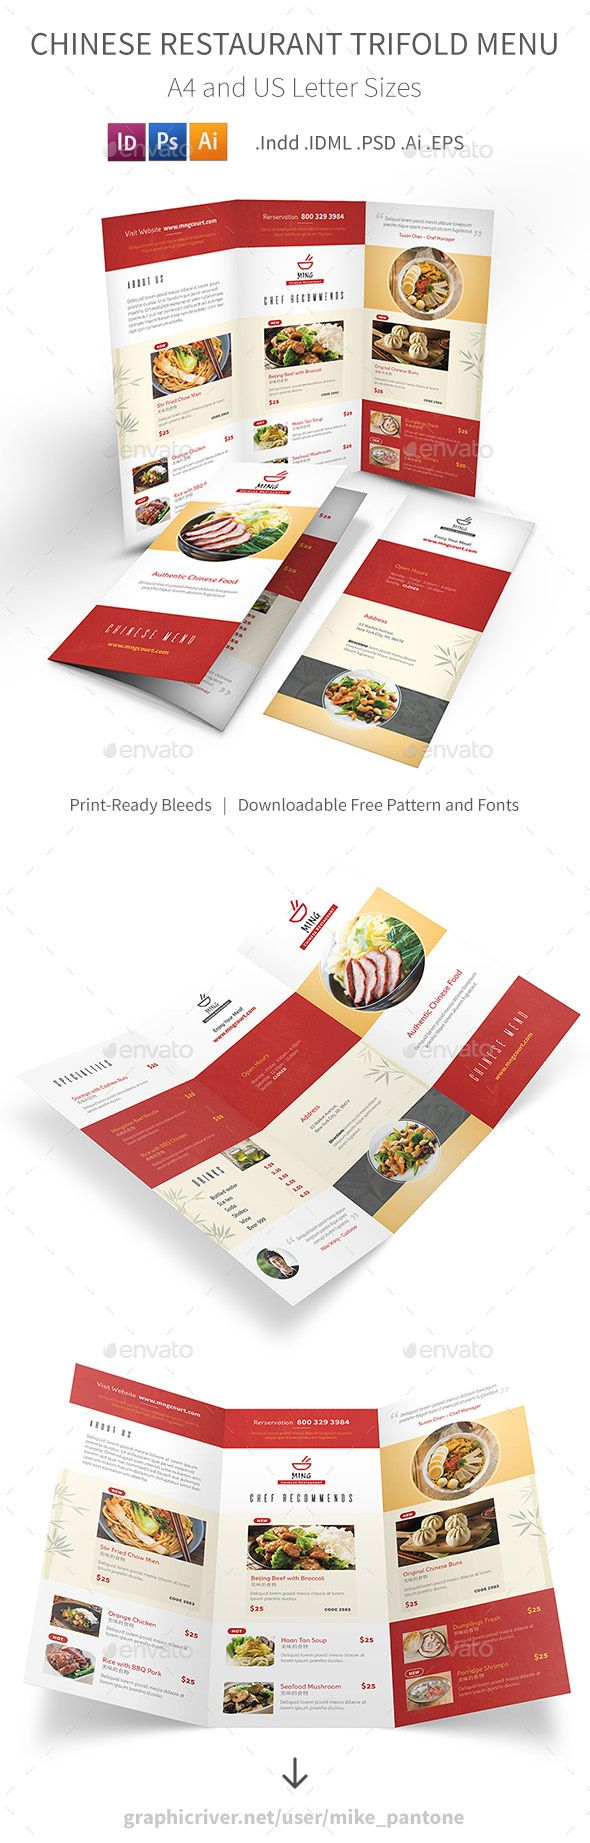 Chinese Restaurant Trifold Menu Menu Printing Food Menu And - Tri fold menu template